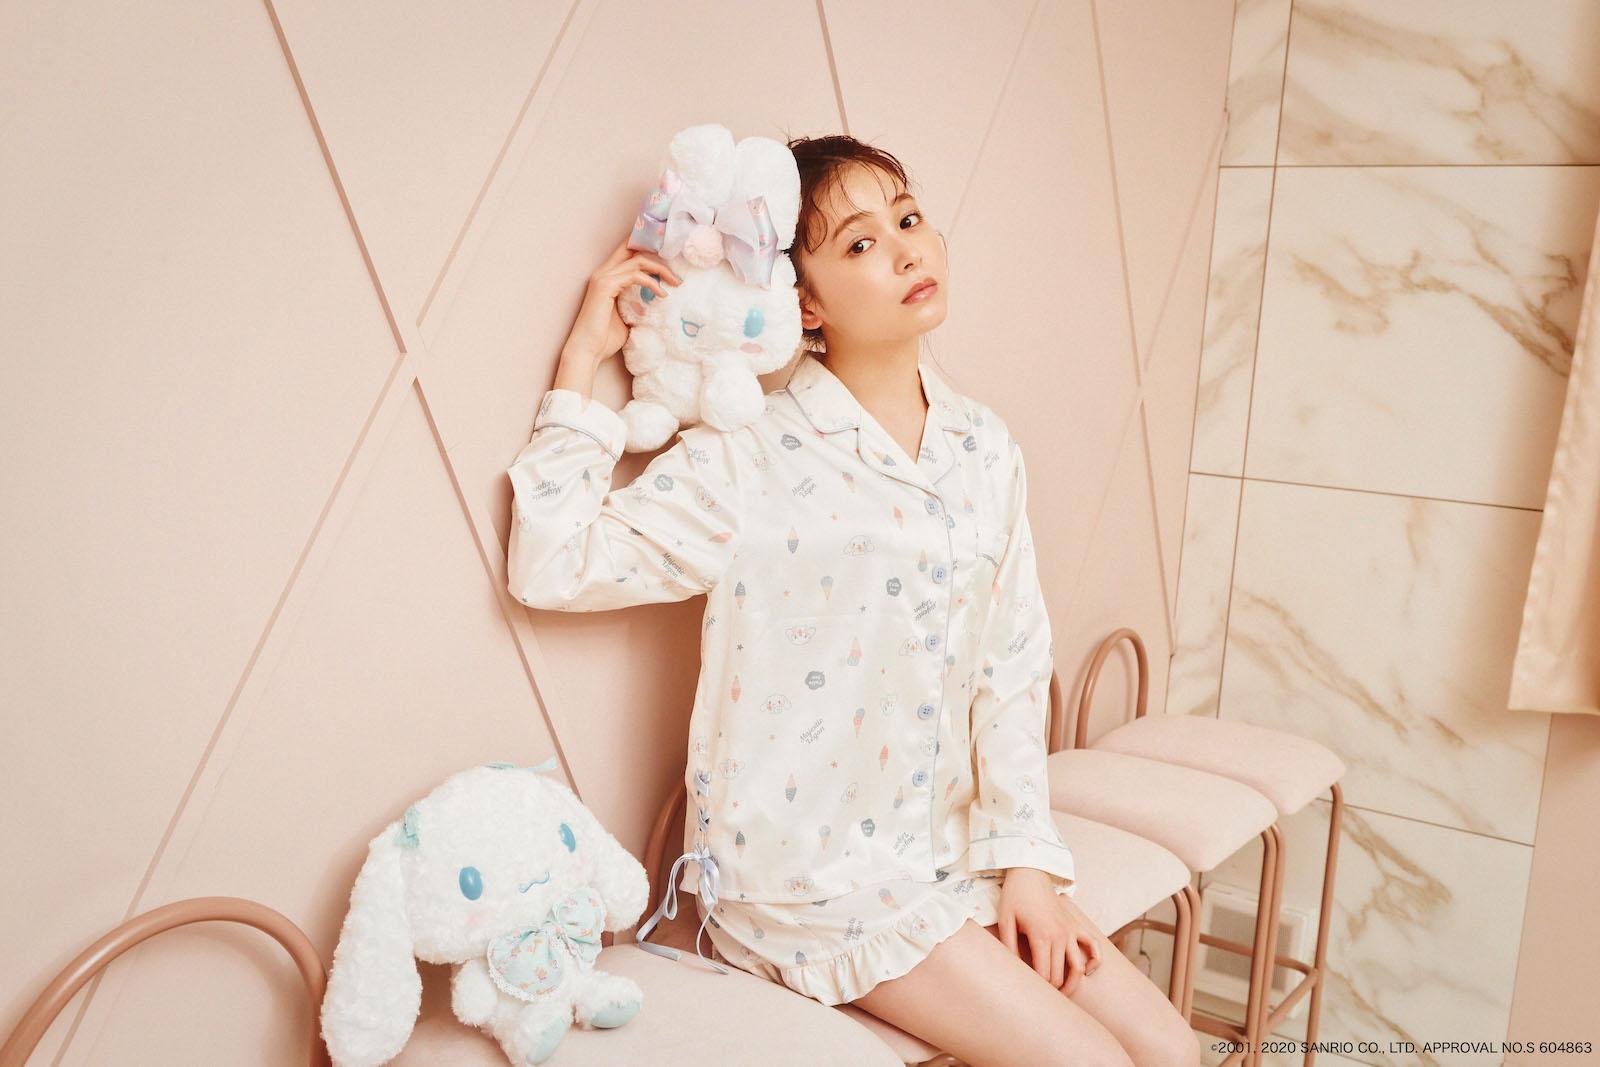 MAJE×久間田琳加 Vol.3|2020はキュートなルームウェアを着ておうち観戦♪